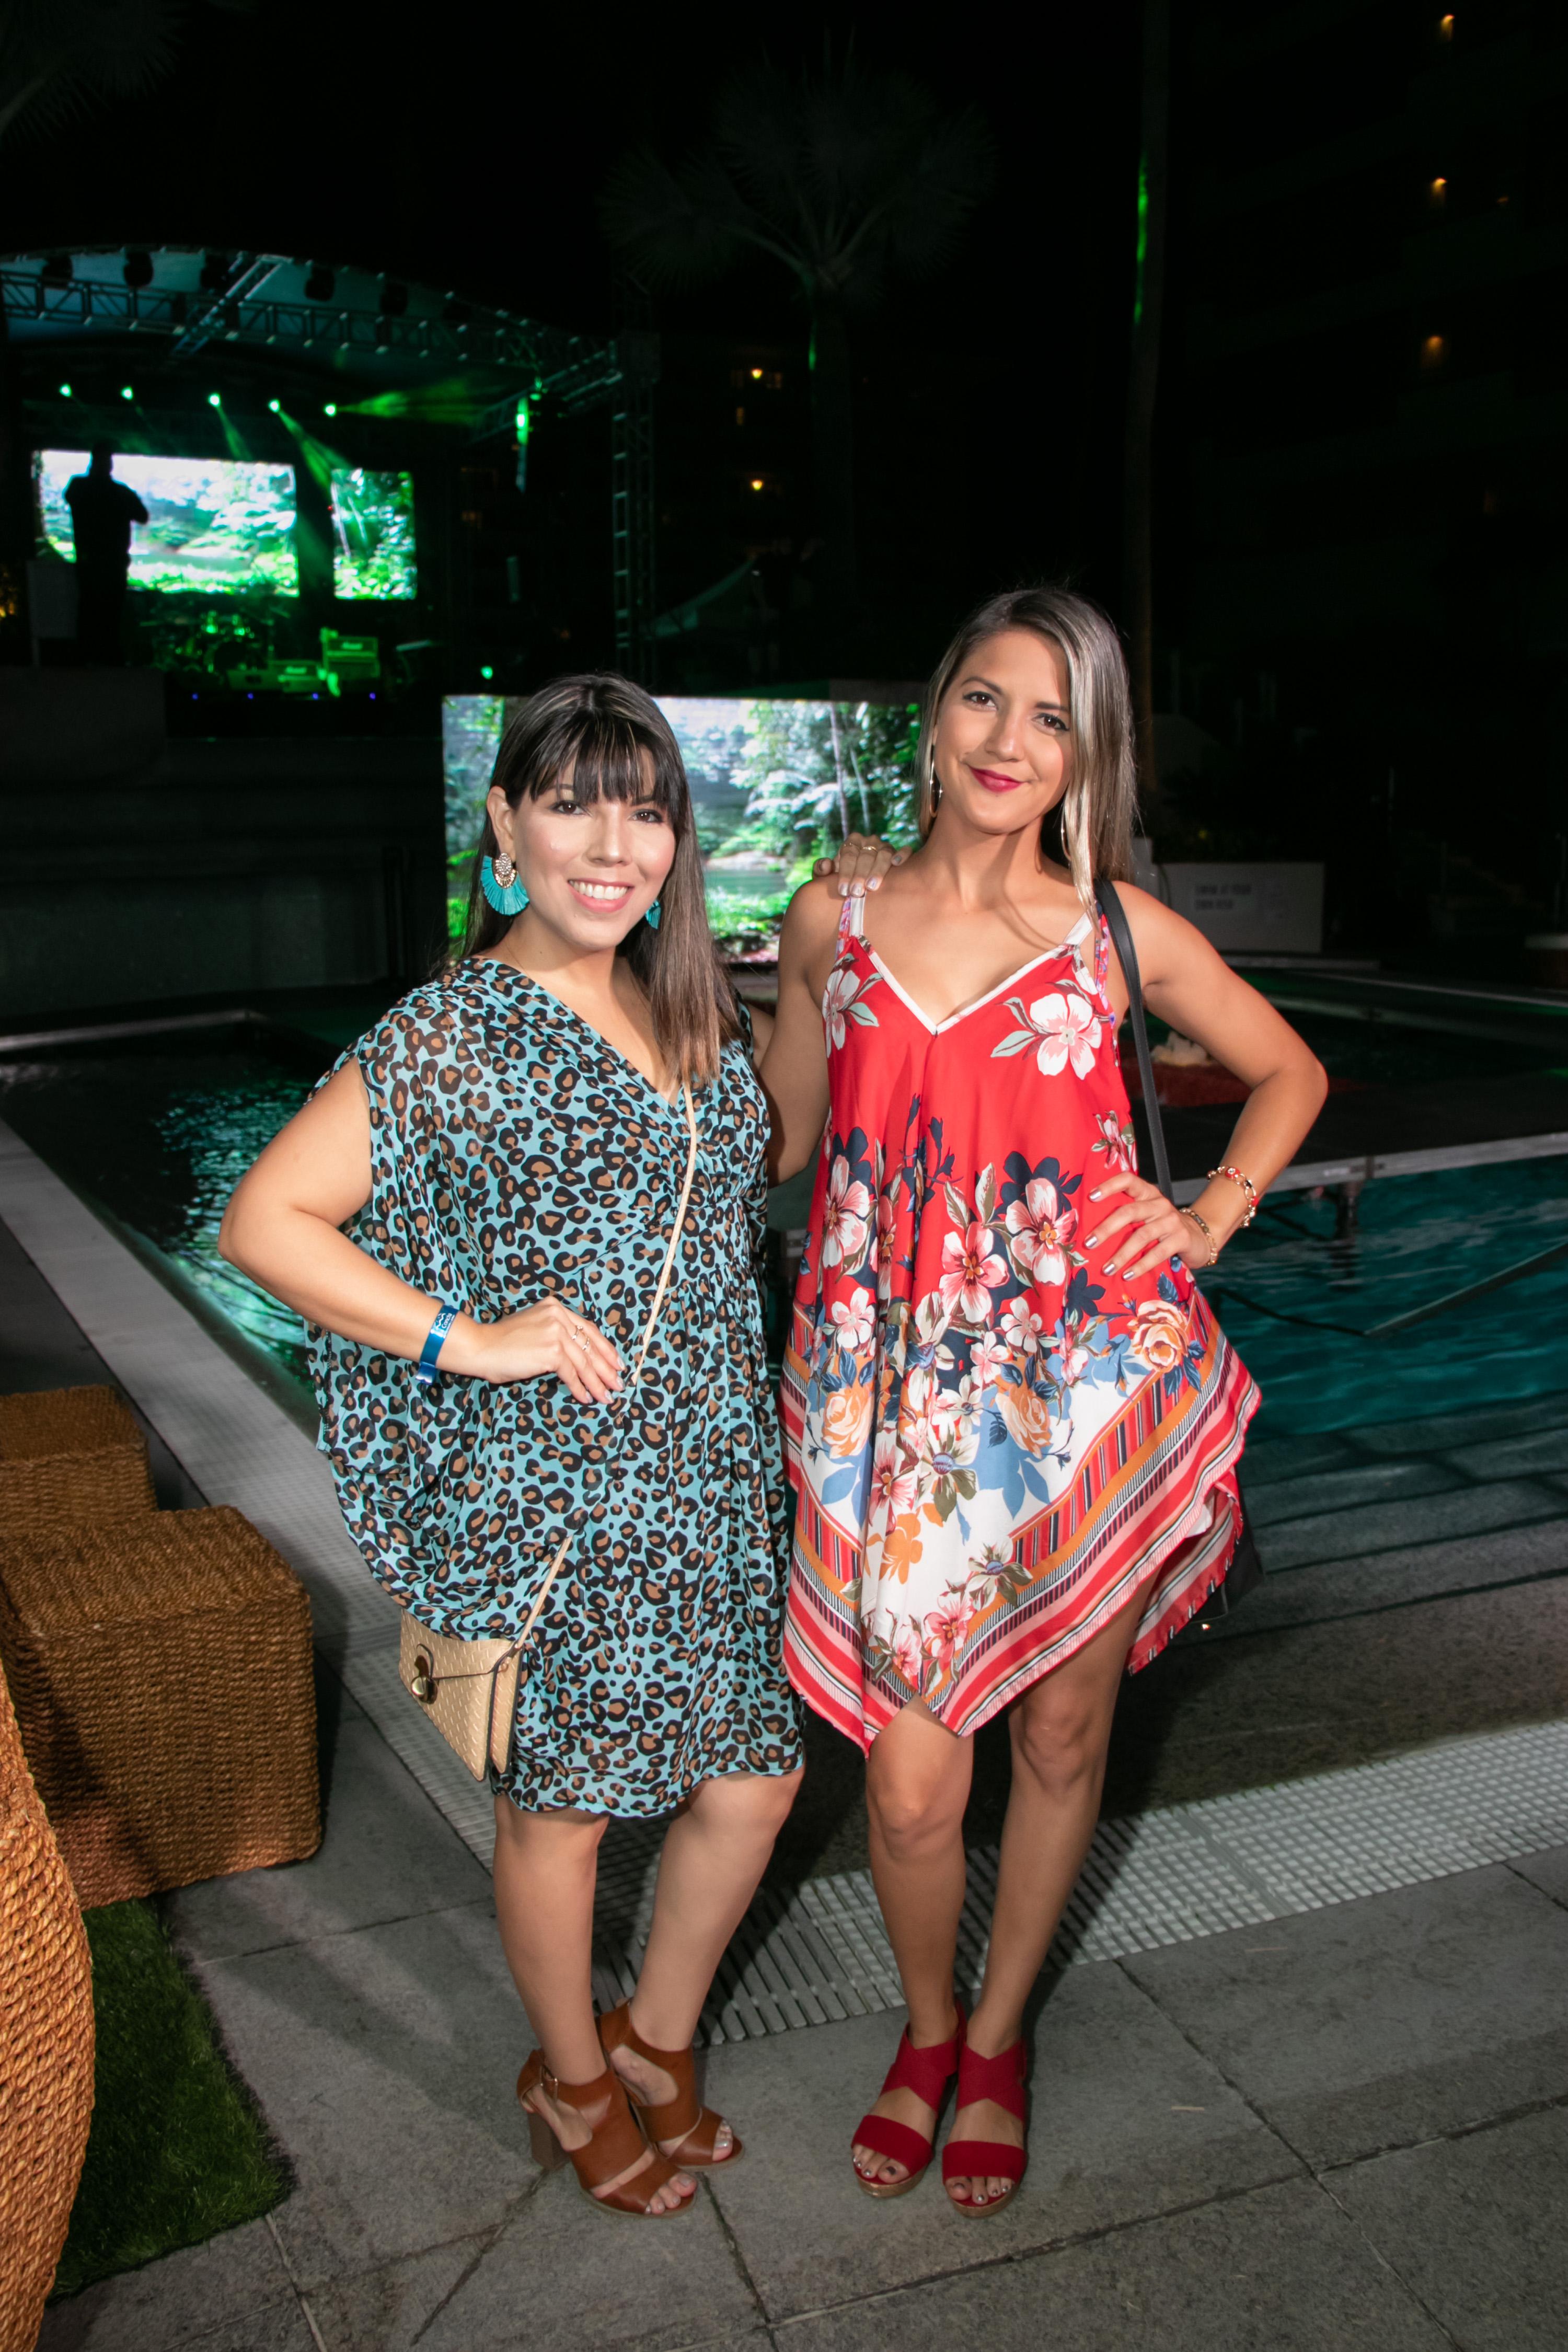 Elaine Hernández y Fabiola Pérez. (Suministrada)